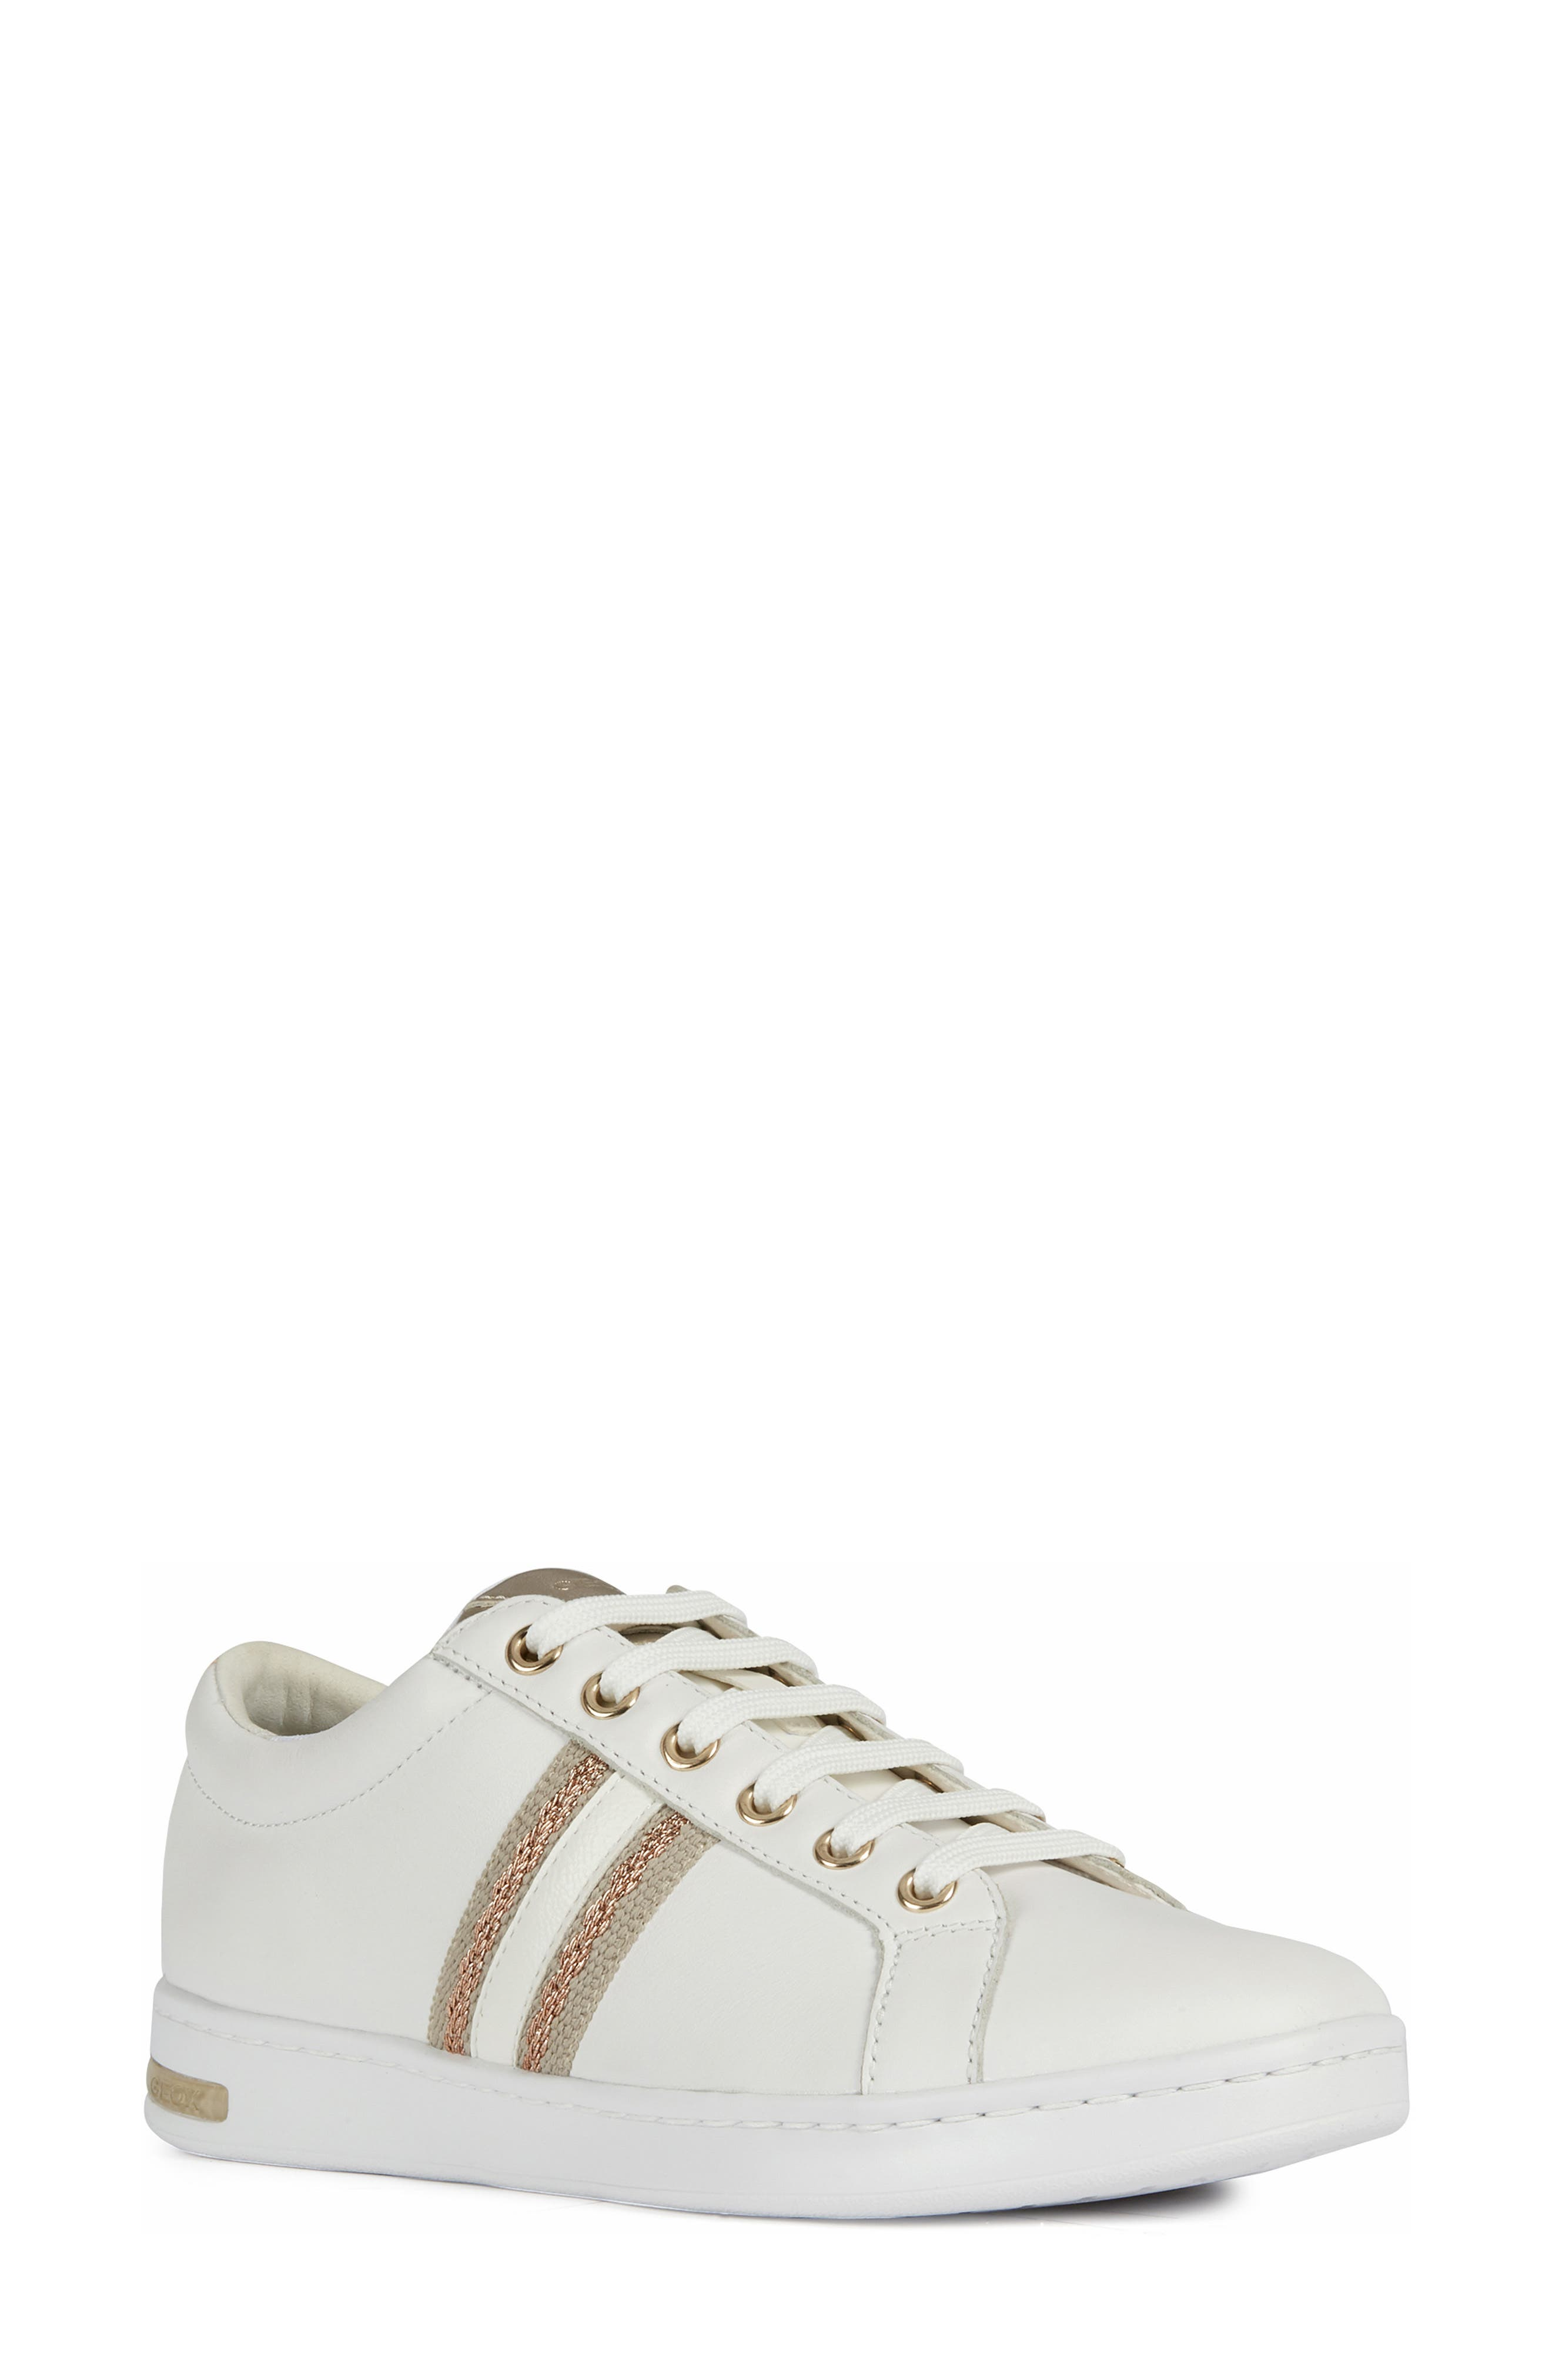 Geox Jaysen Sneaker (Women) | Nordstrom